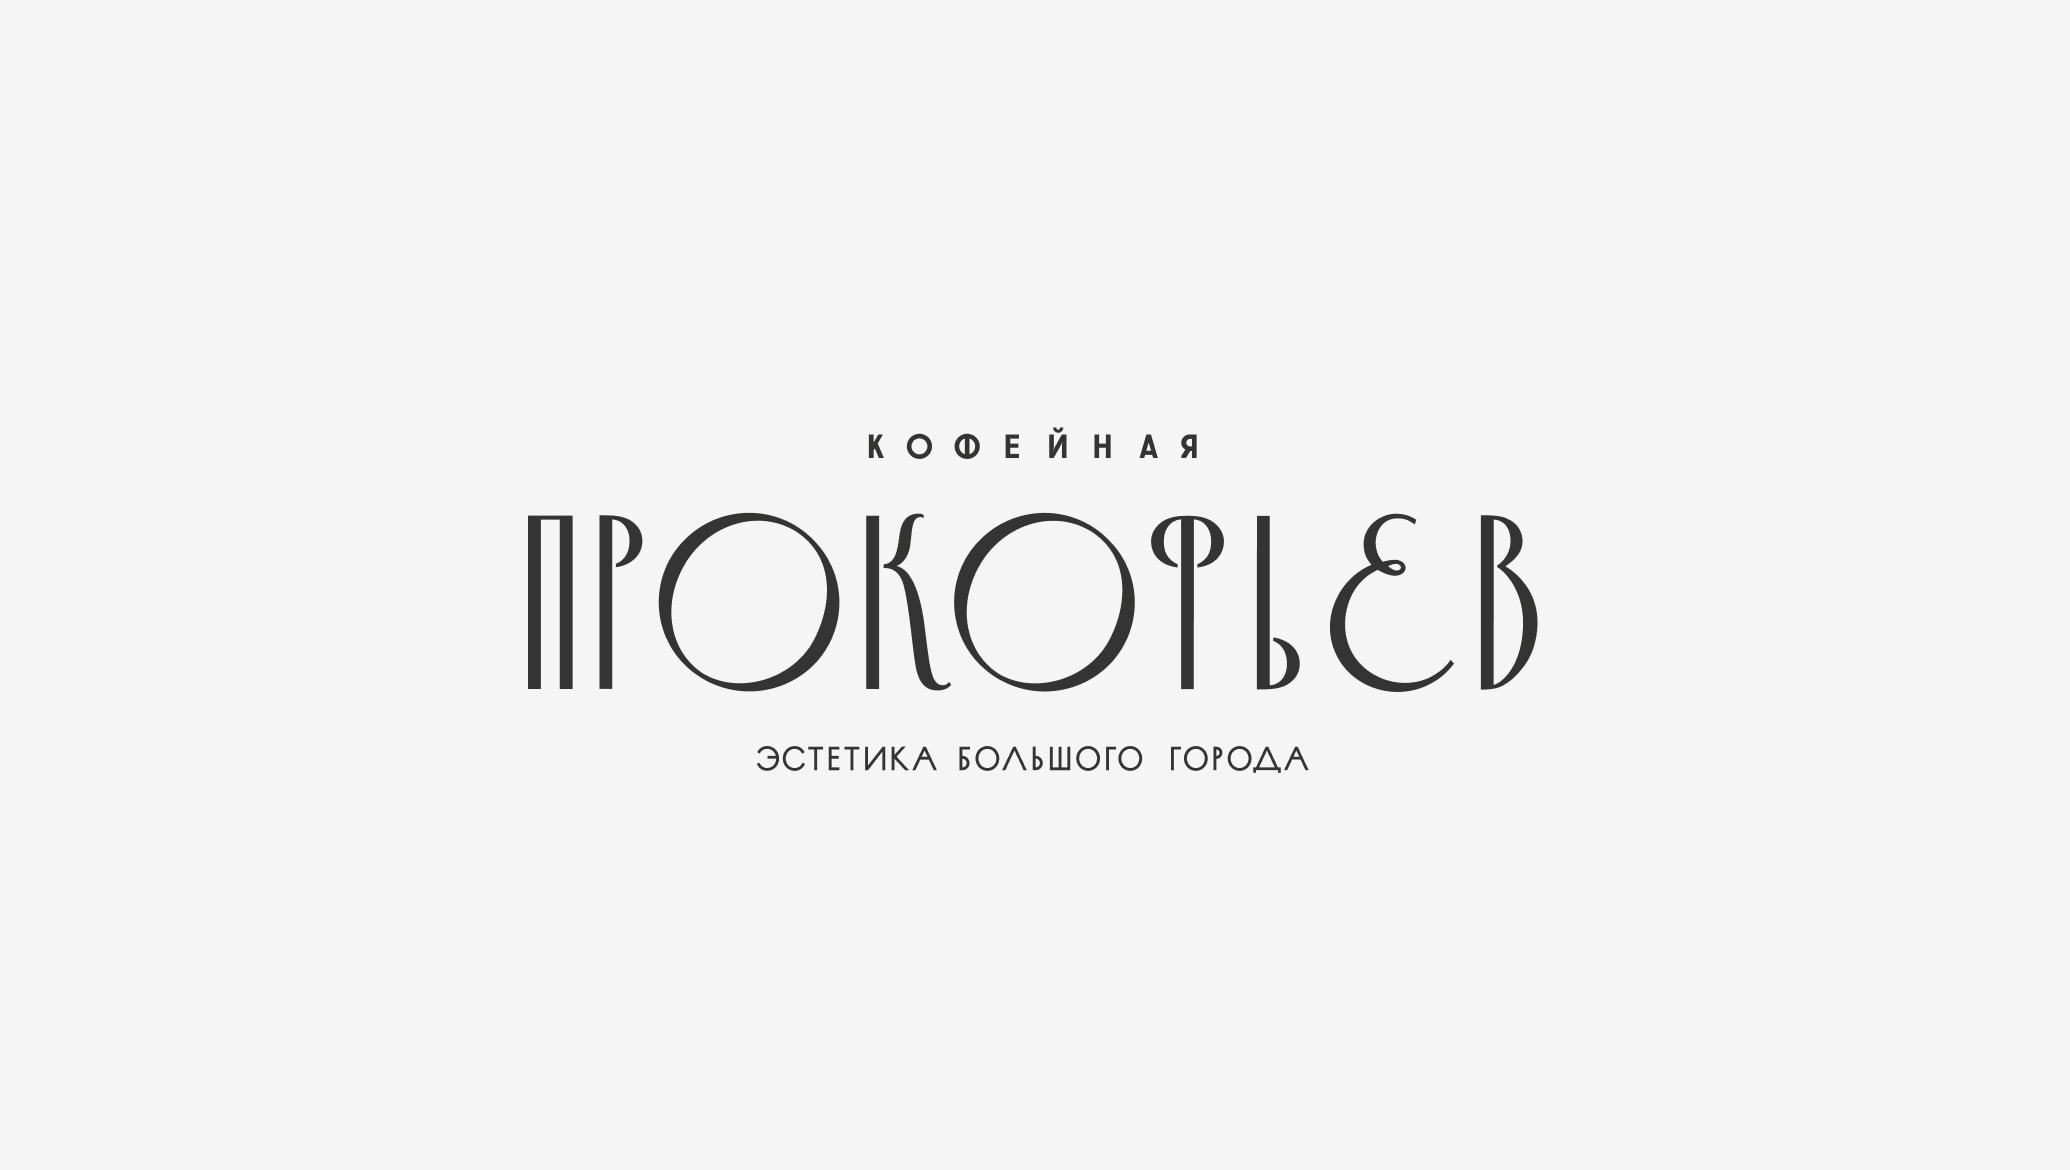 prokofiev_02-2